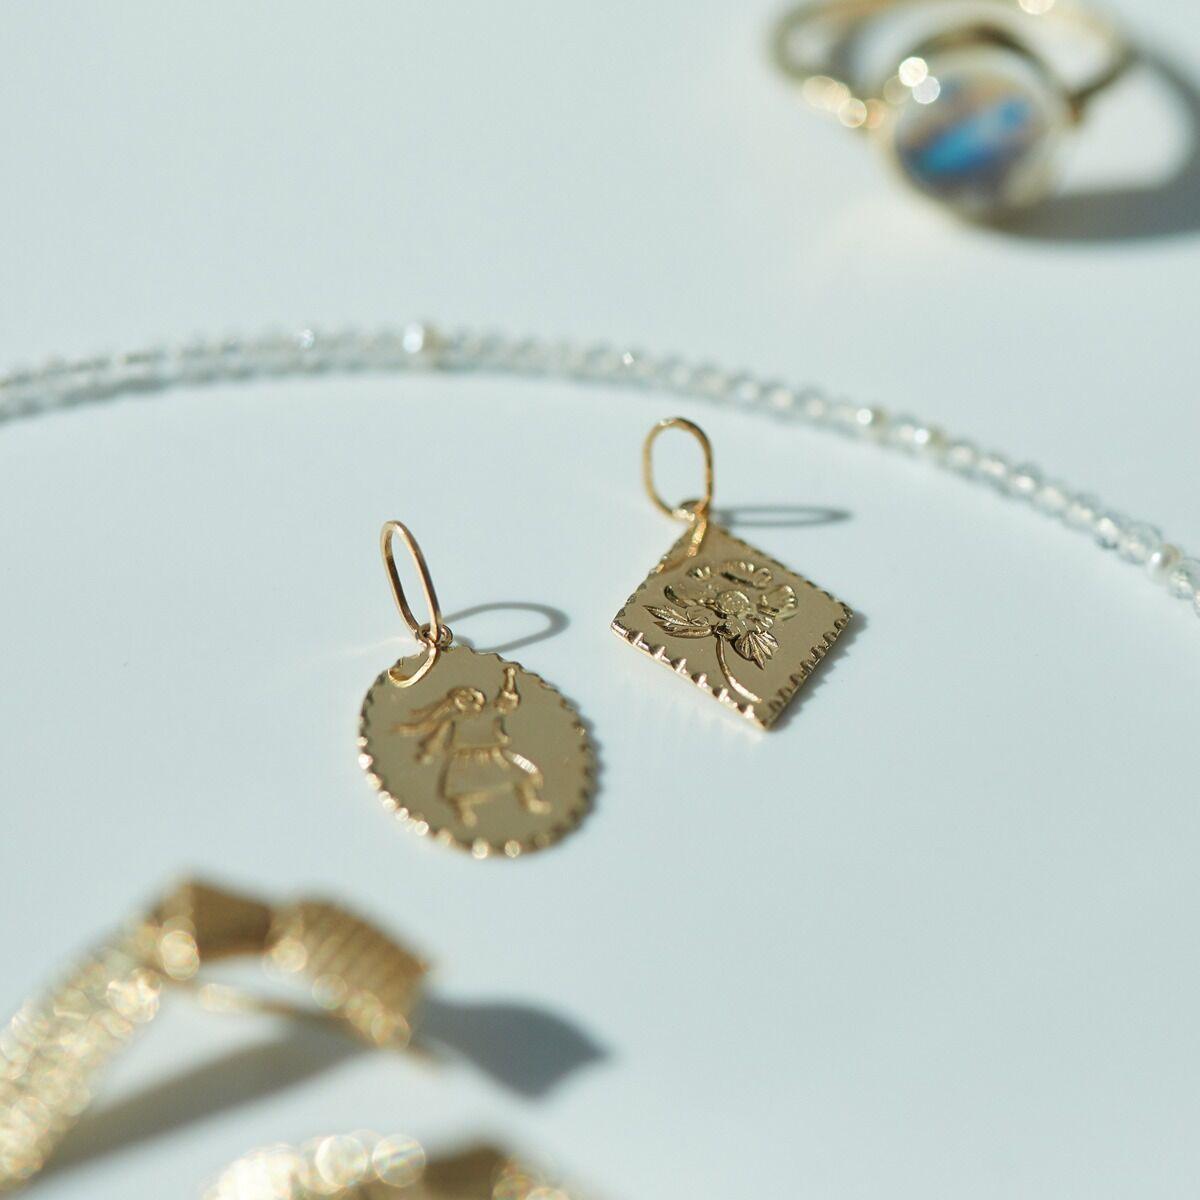 Anemone Charm image